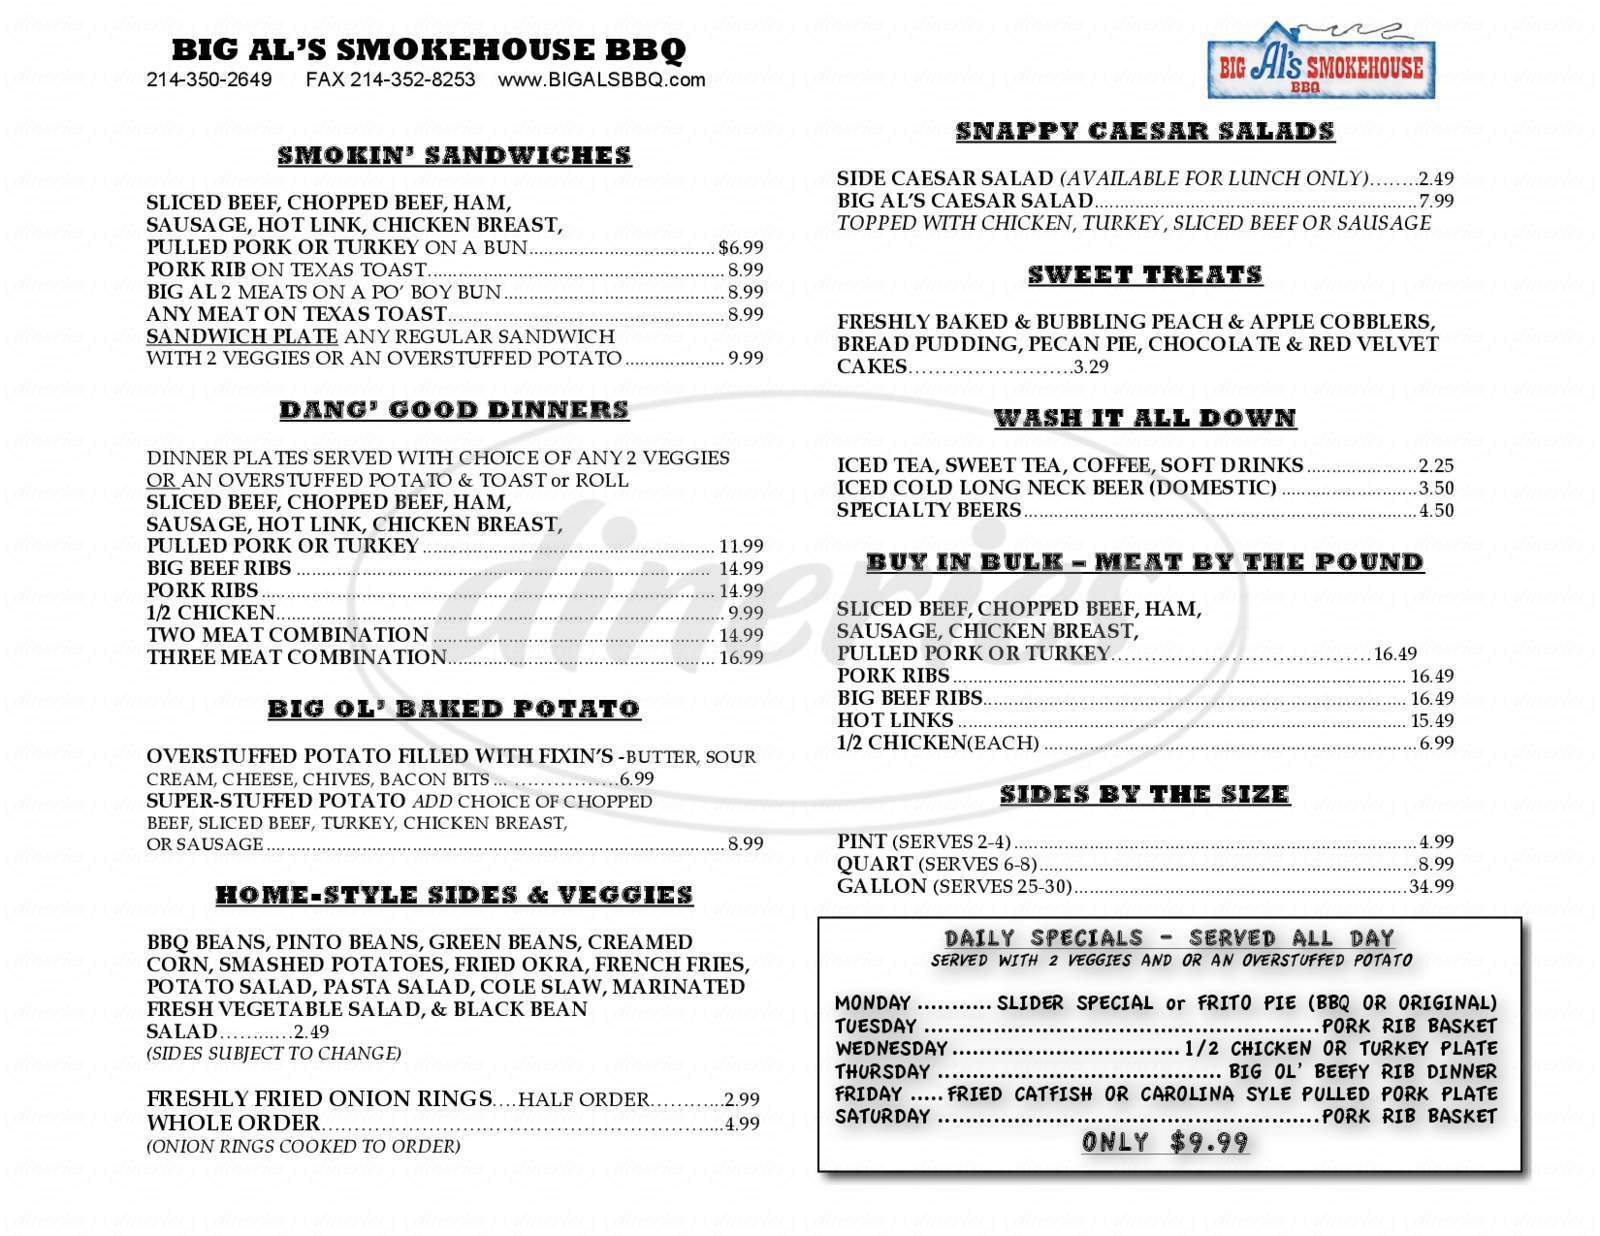 menu for Big Al's Smokehouse Barbeque